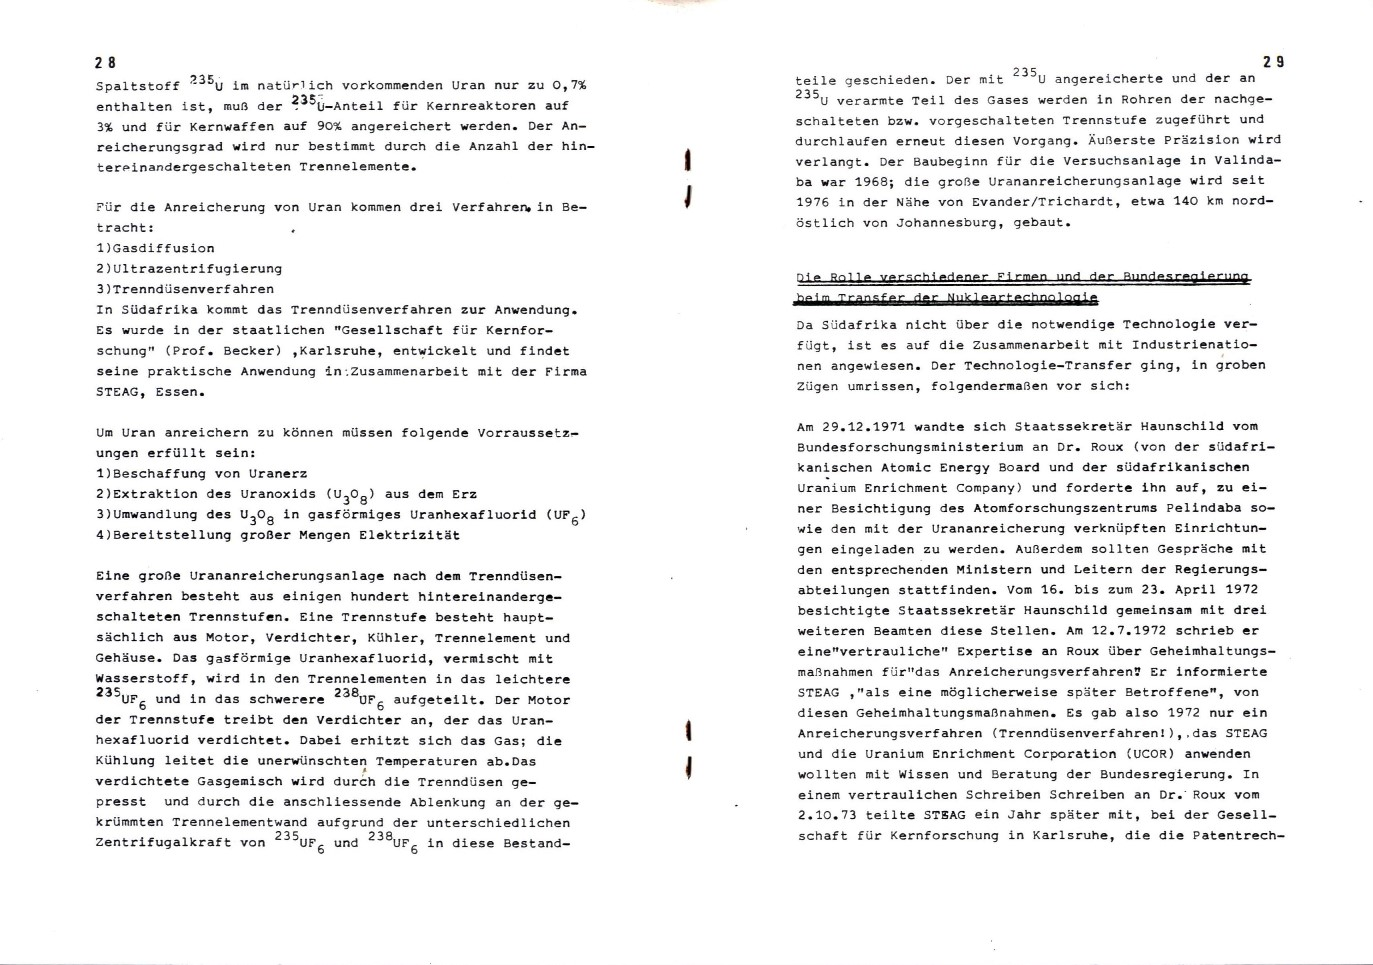 Muenster_AKAFRIK_1981_Suedafrika_BRD_16